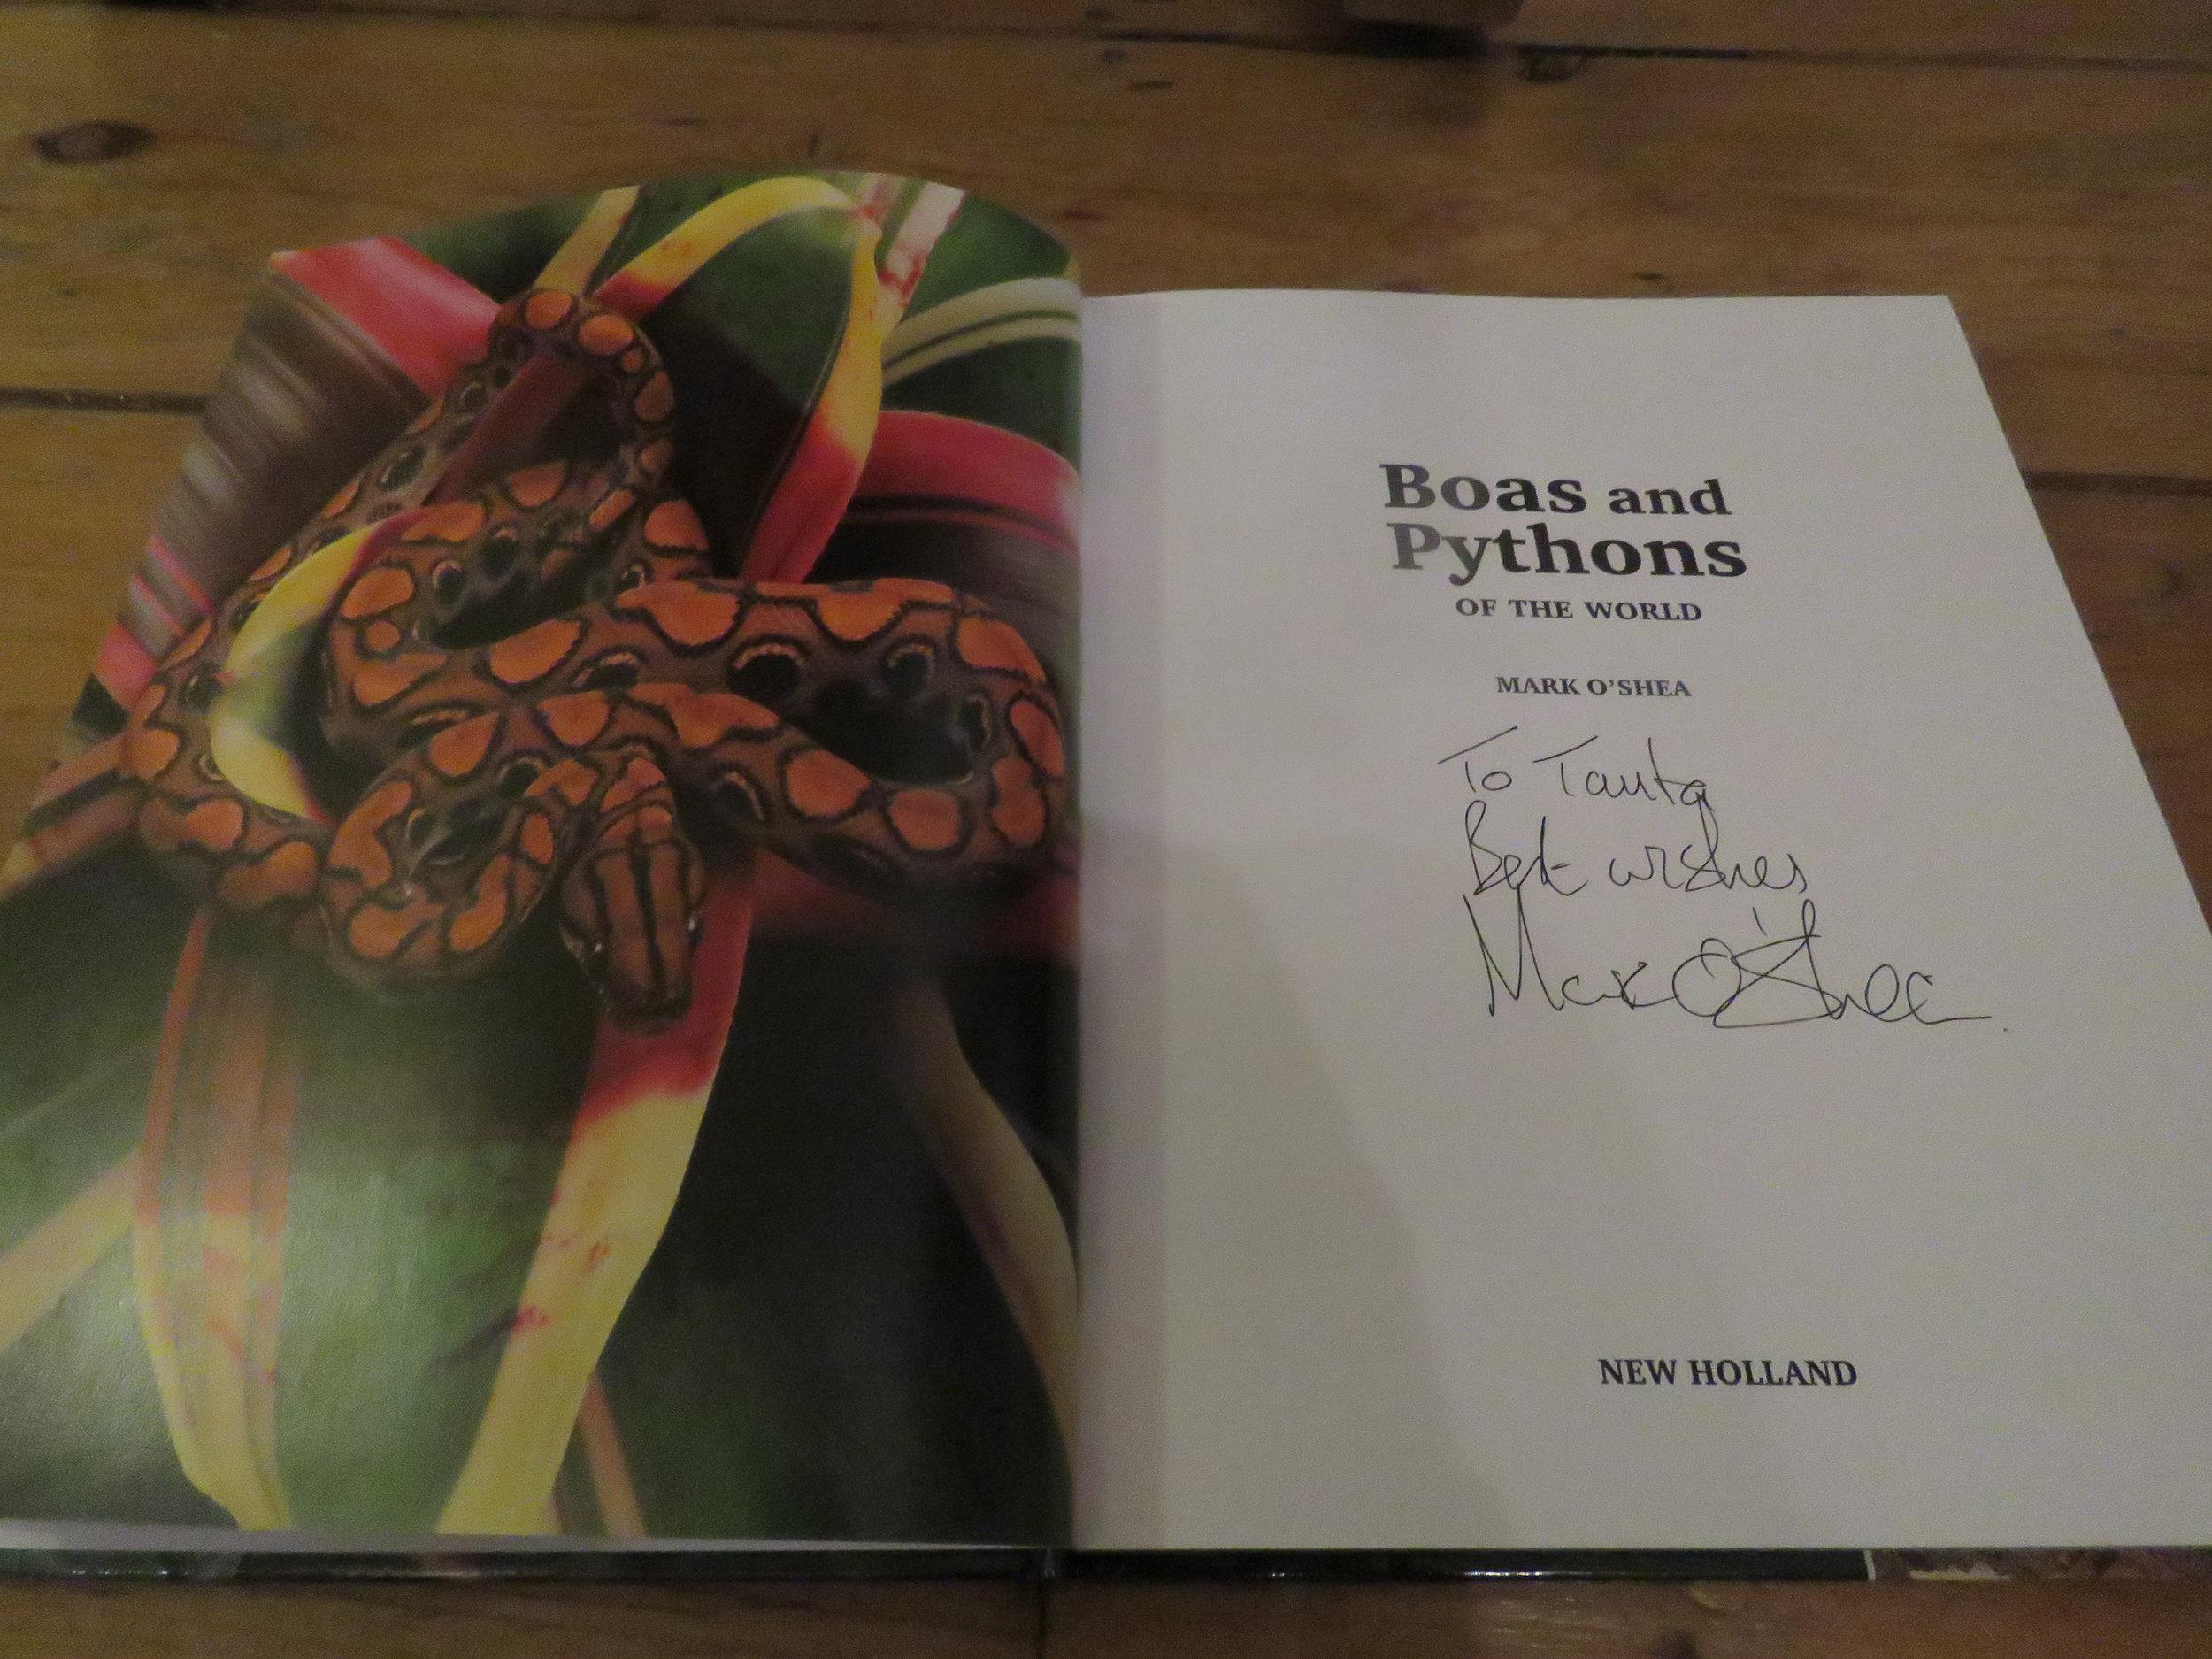 My signed copy of Mark O'Shea's book ' Boas and Pythons of the World' | Credit: Talita Bateman